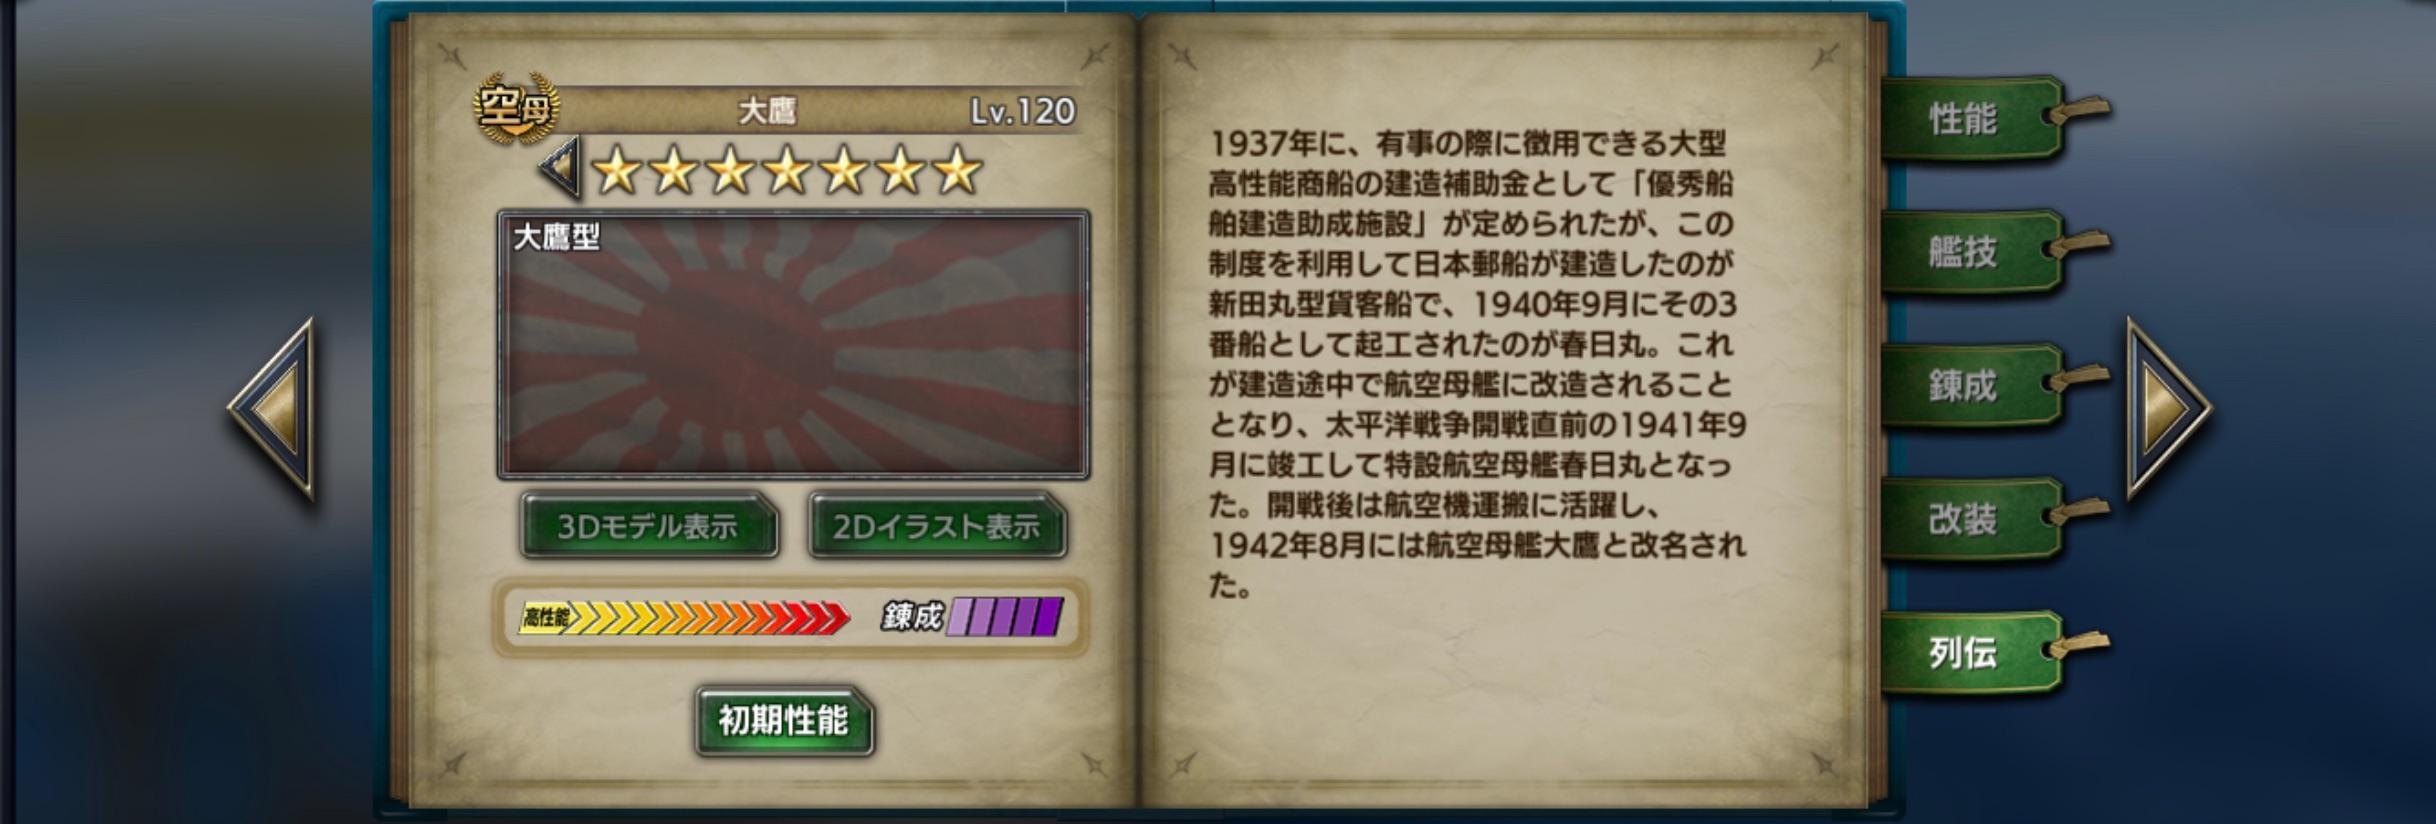 Taiyo-history